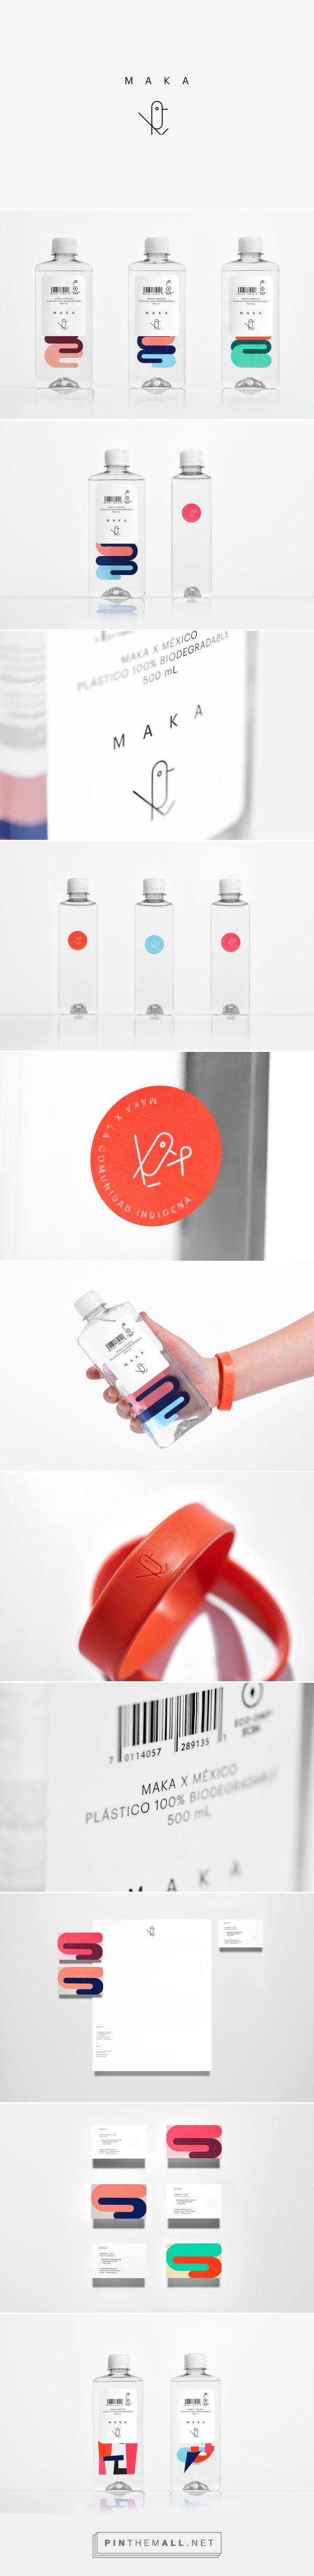 Maka drinking water packaging design by Anagrama - https://www.packagingoftheworld.com/2018/03/maka.html